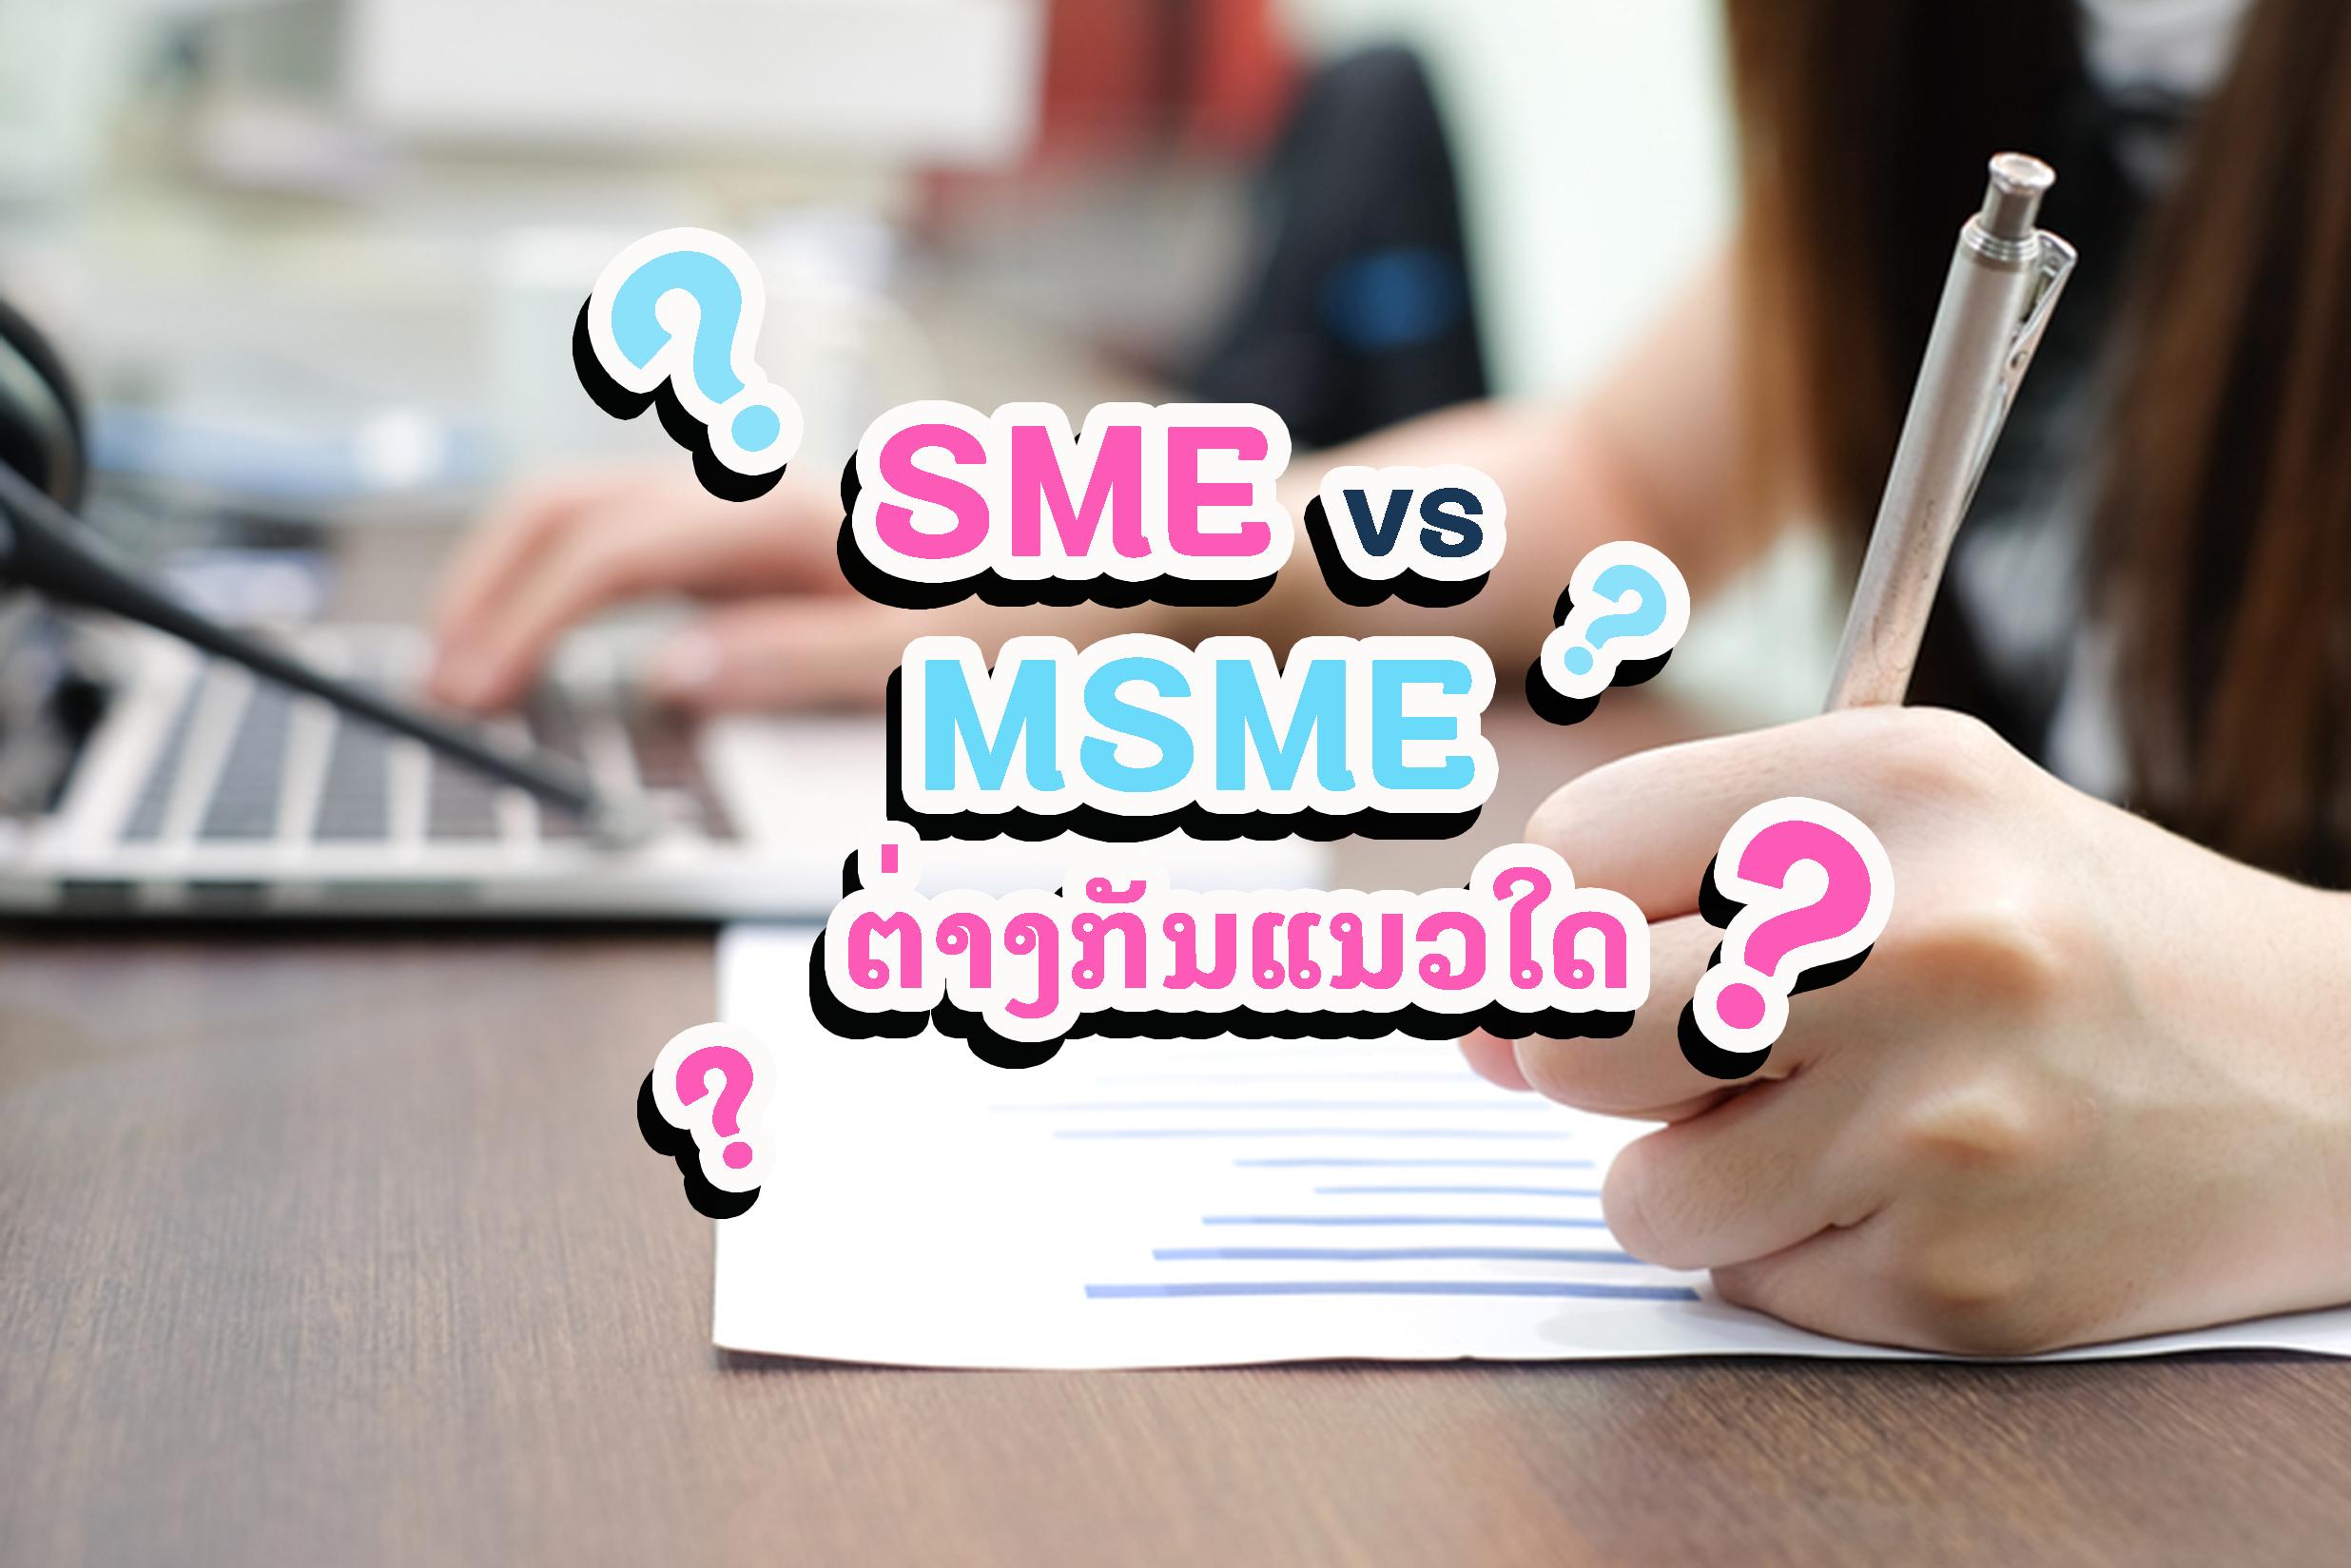 SME Vs MSME ຕ່າງກັນແນວໃດ?